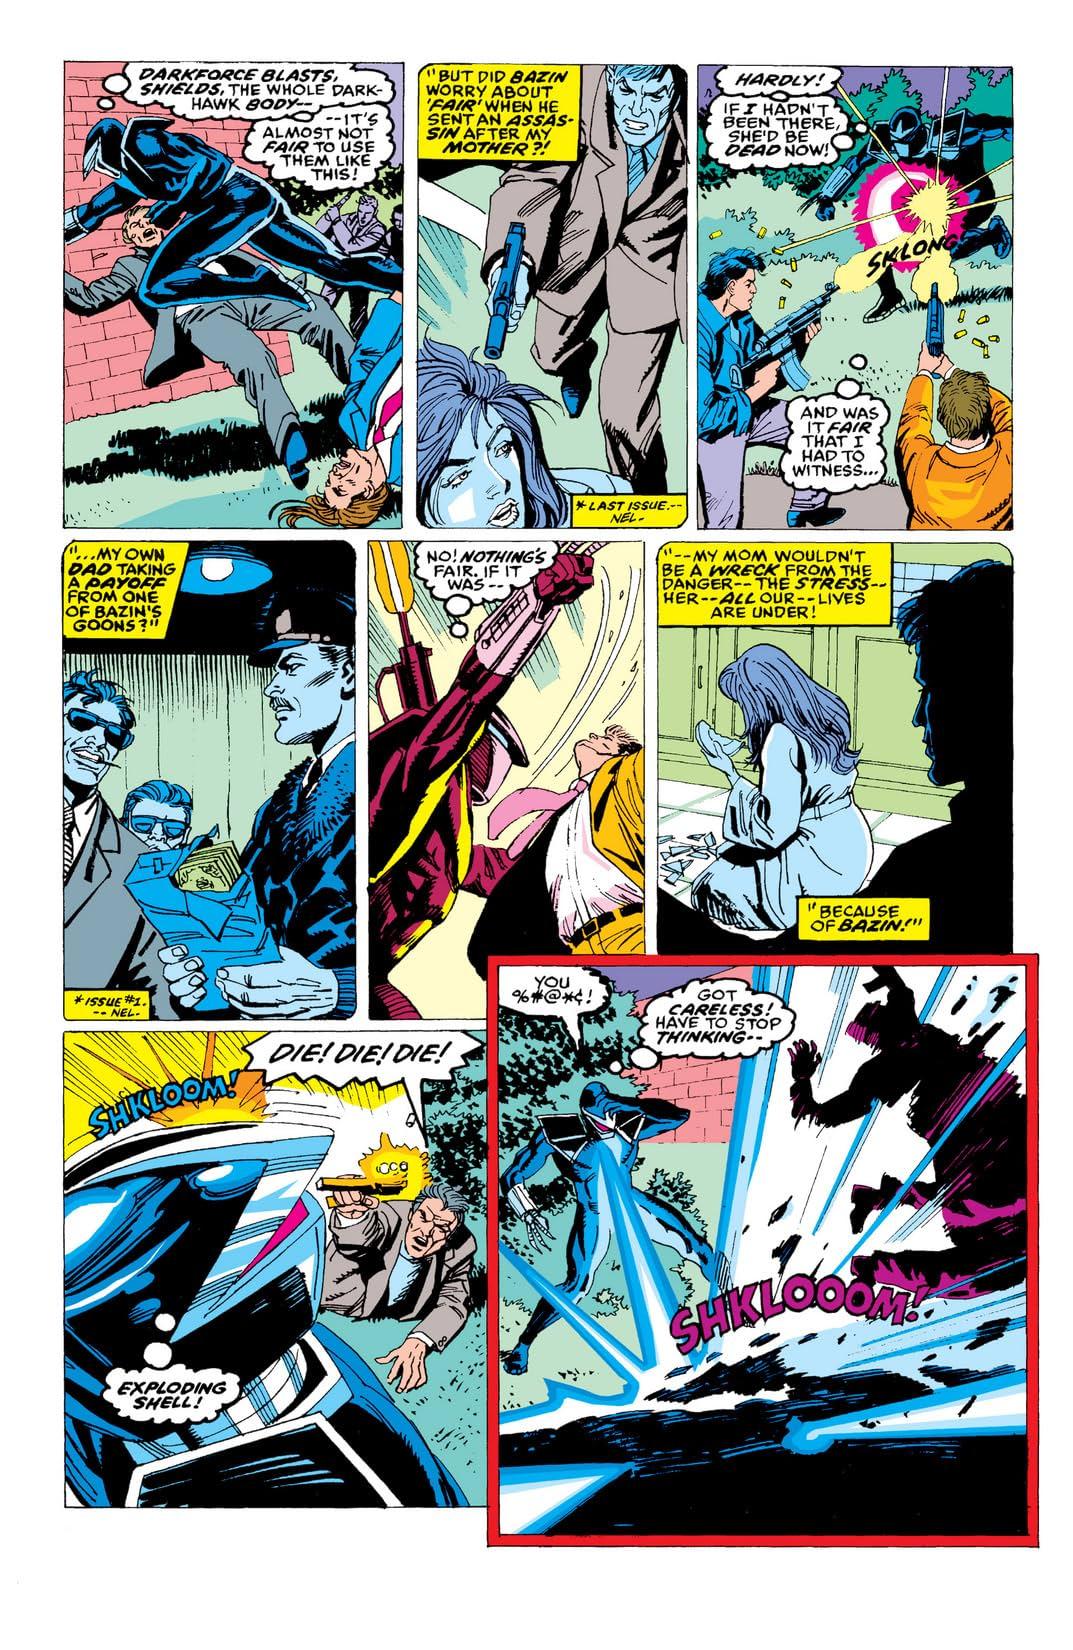 Darkhawk #6